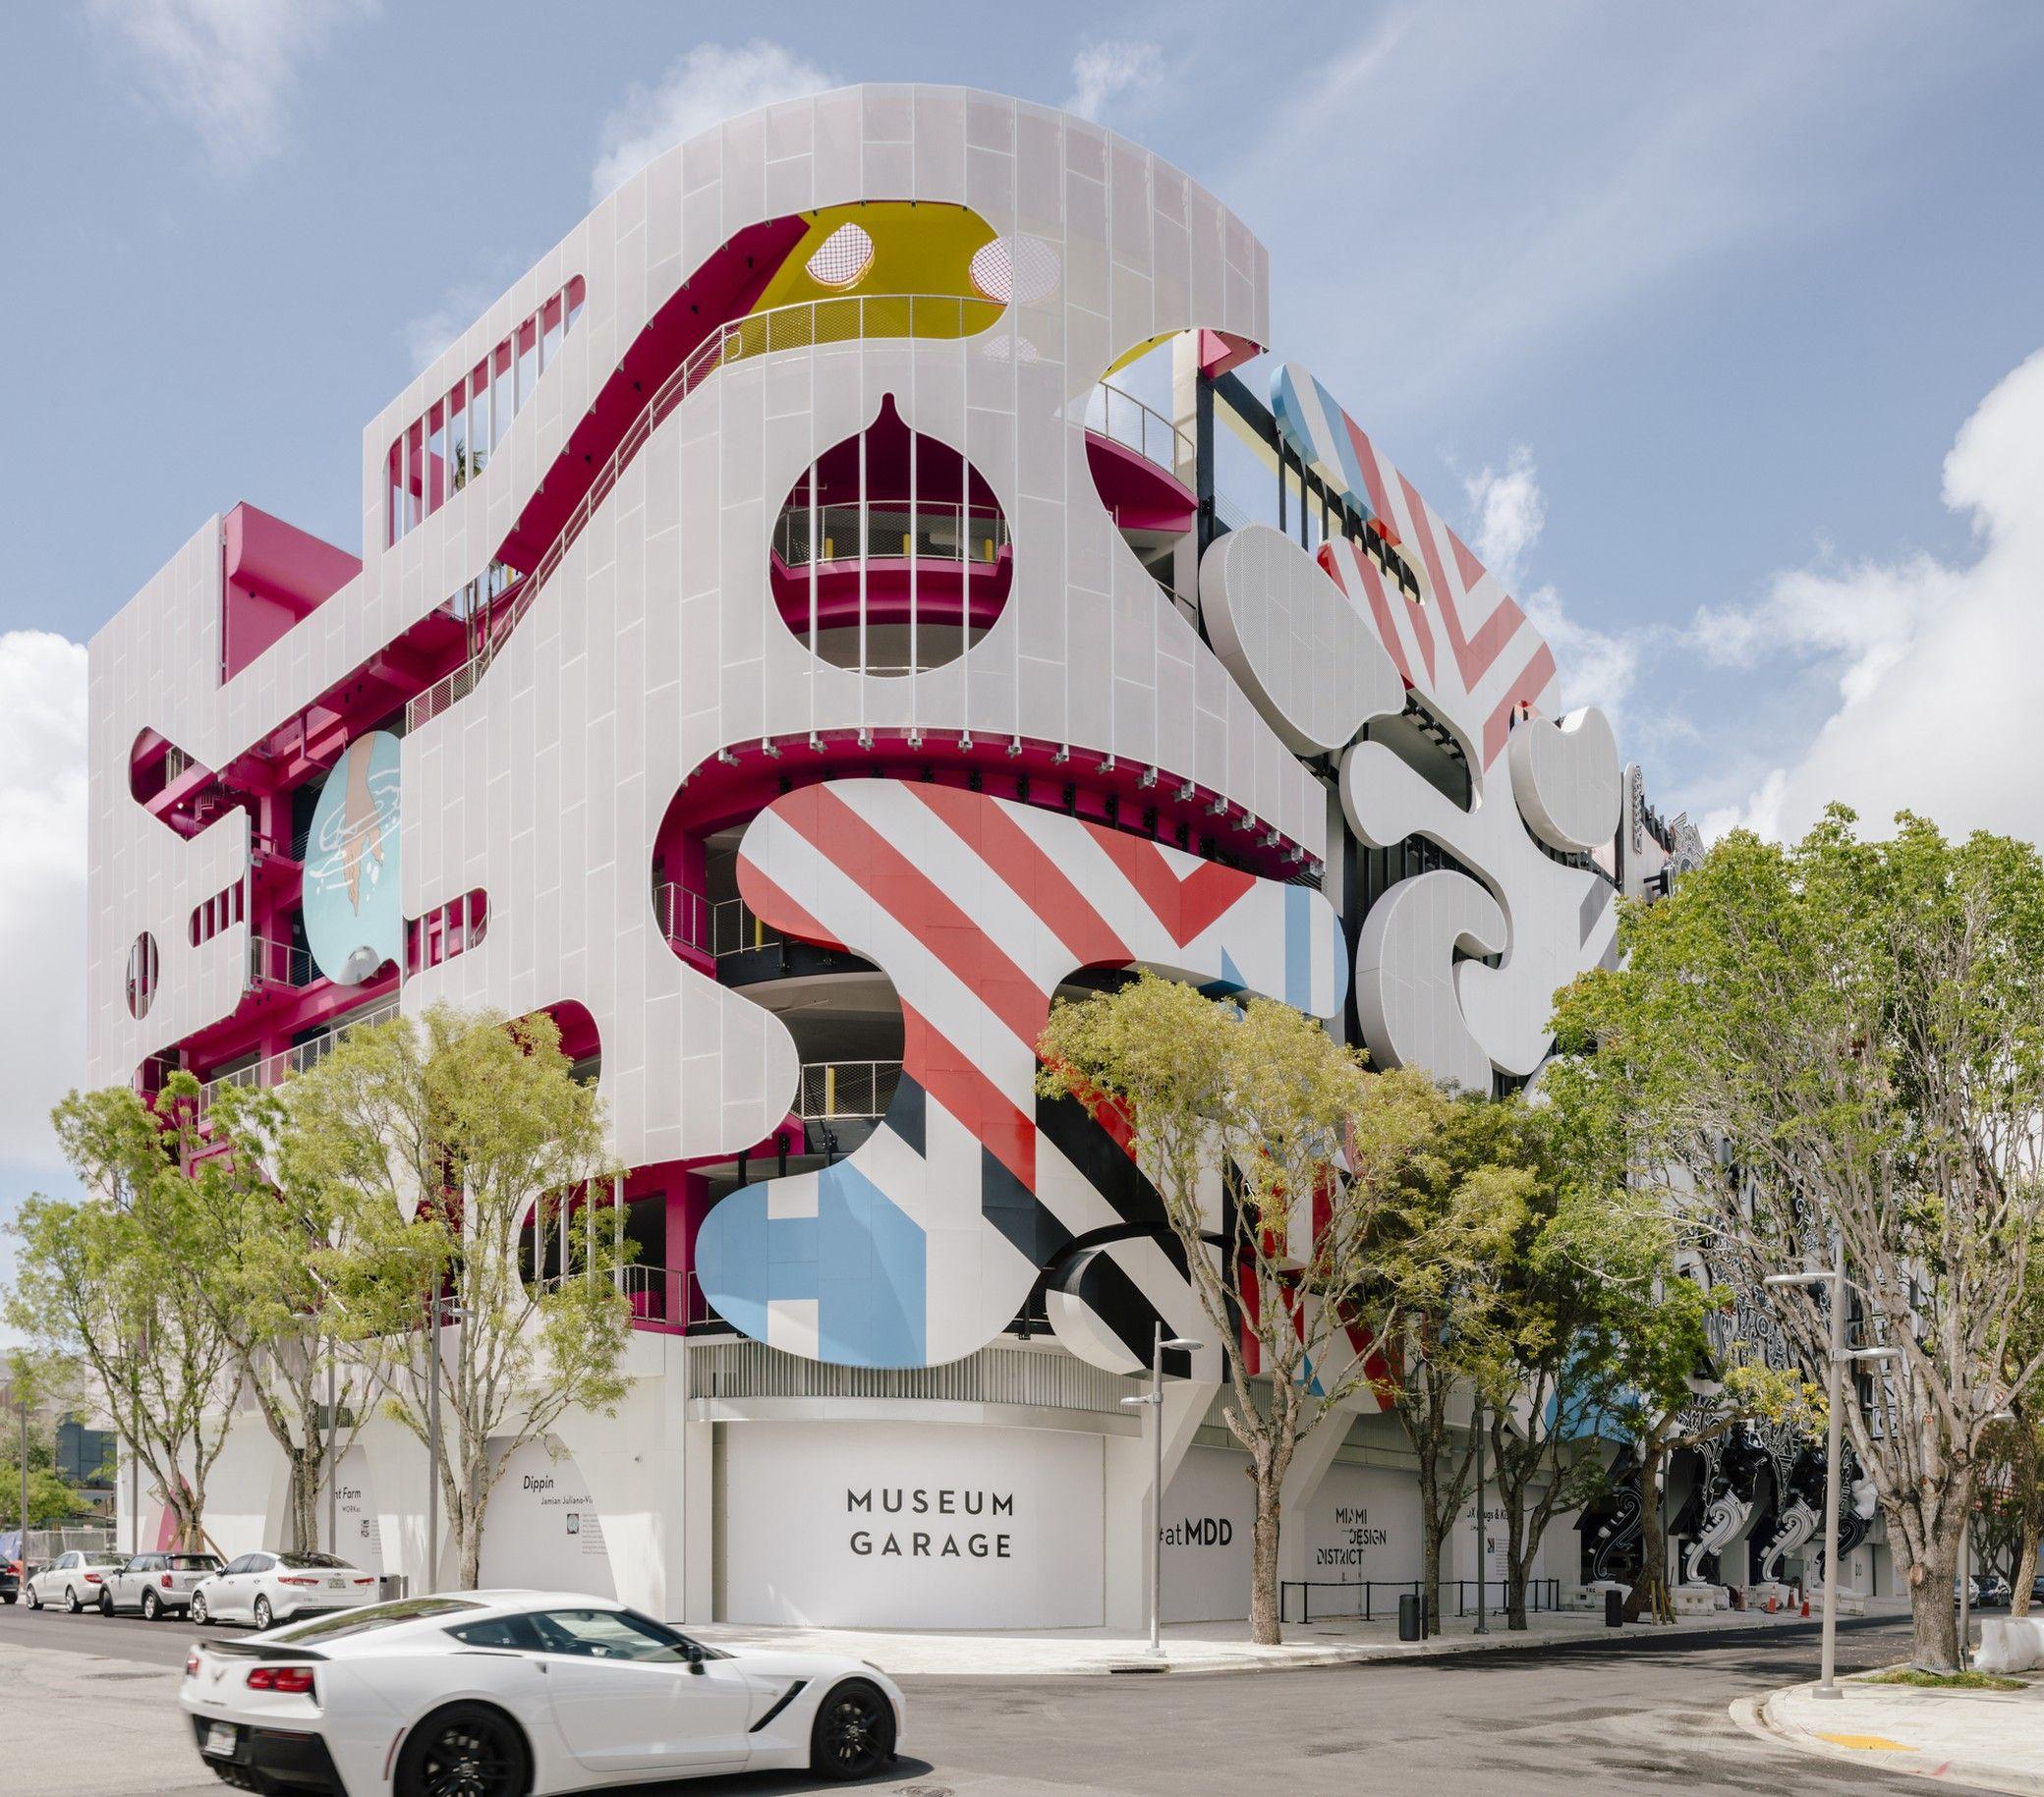 Miami Museum Garage Workac Nicolas Buffe Clavel Arquitectos K R And J Mayer H Architects Arch2o Com Miami Design Miami Architecture Garage Design